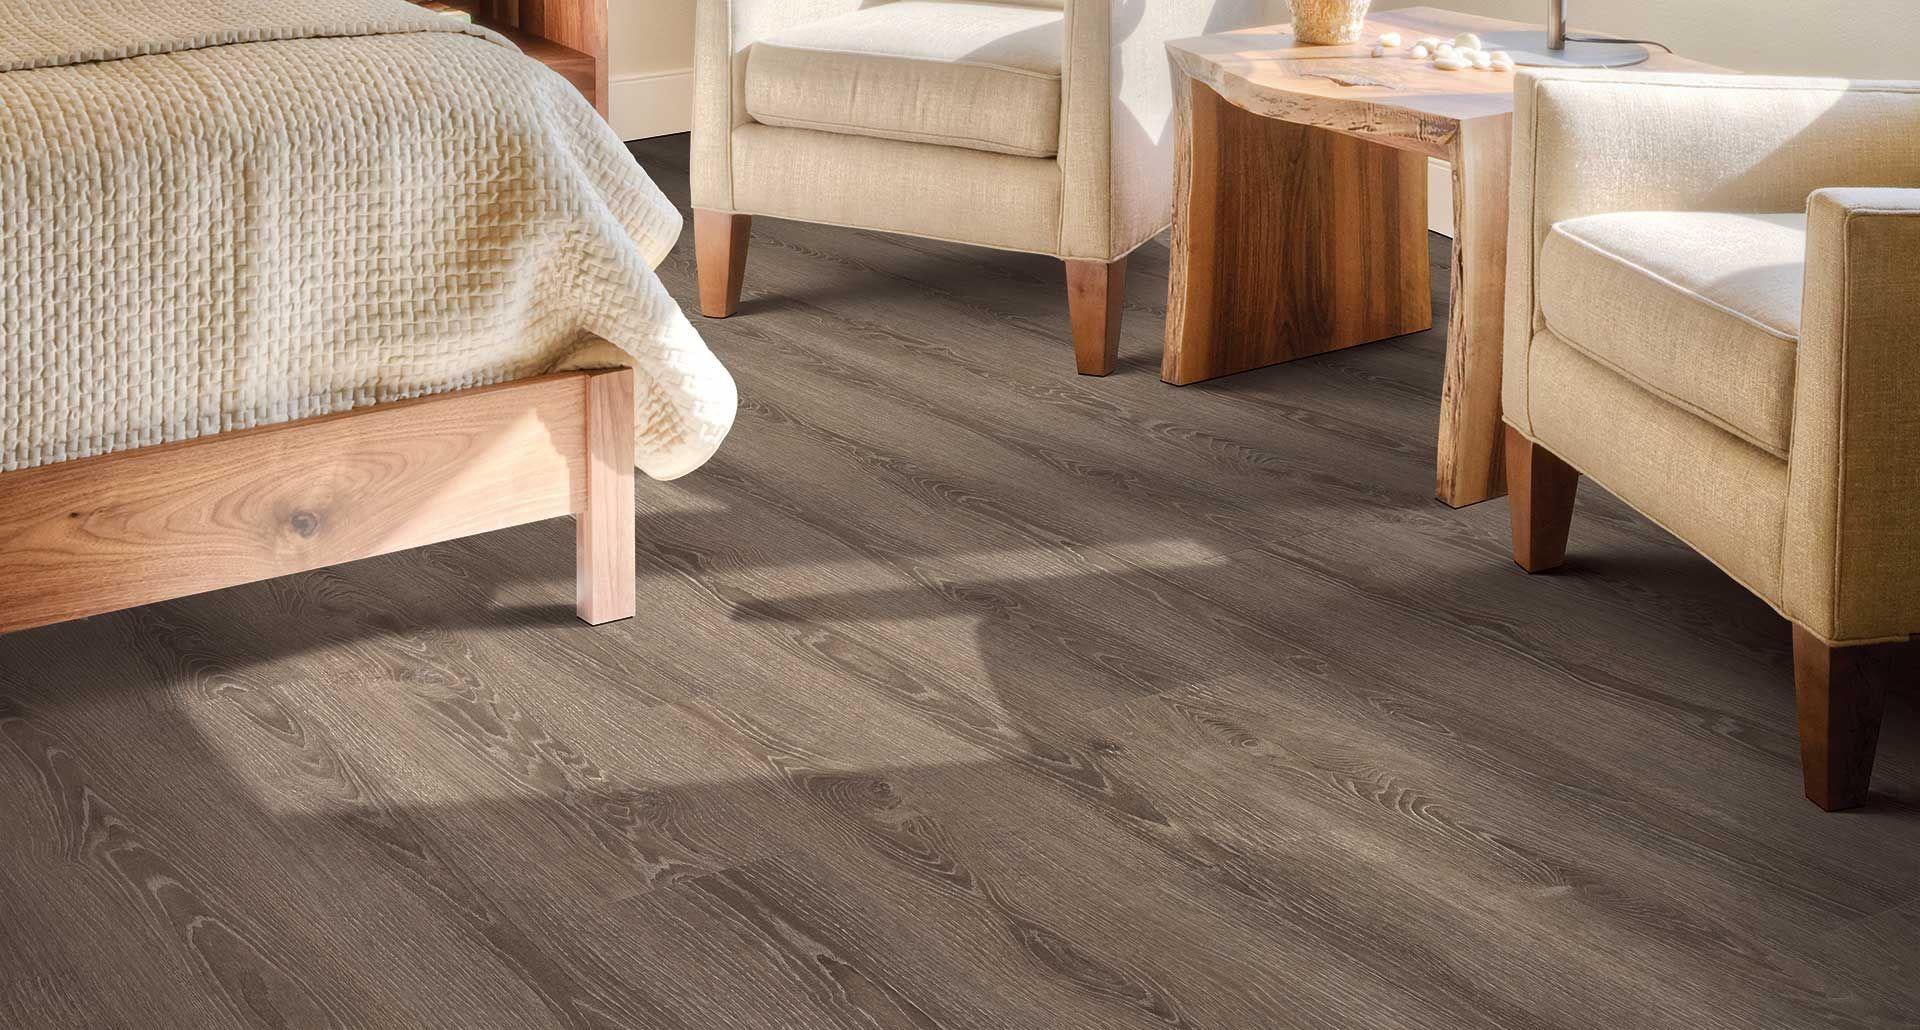 Laminate Floor Light Caramel Color